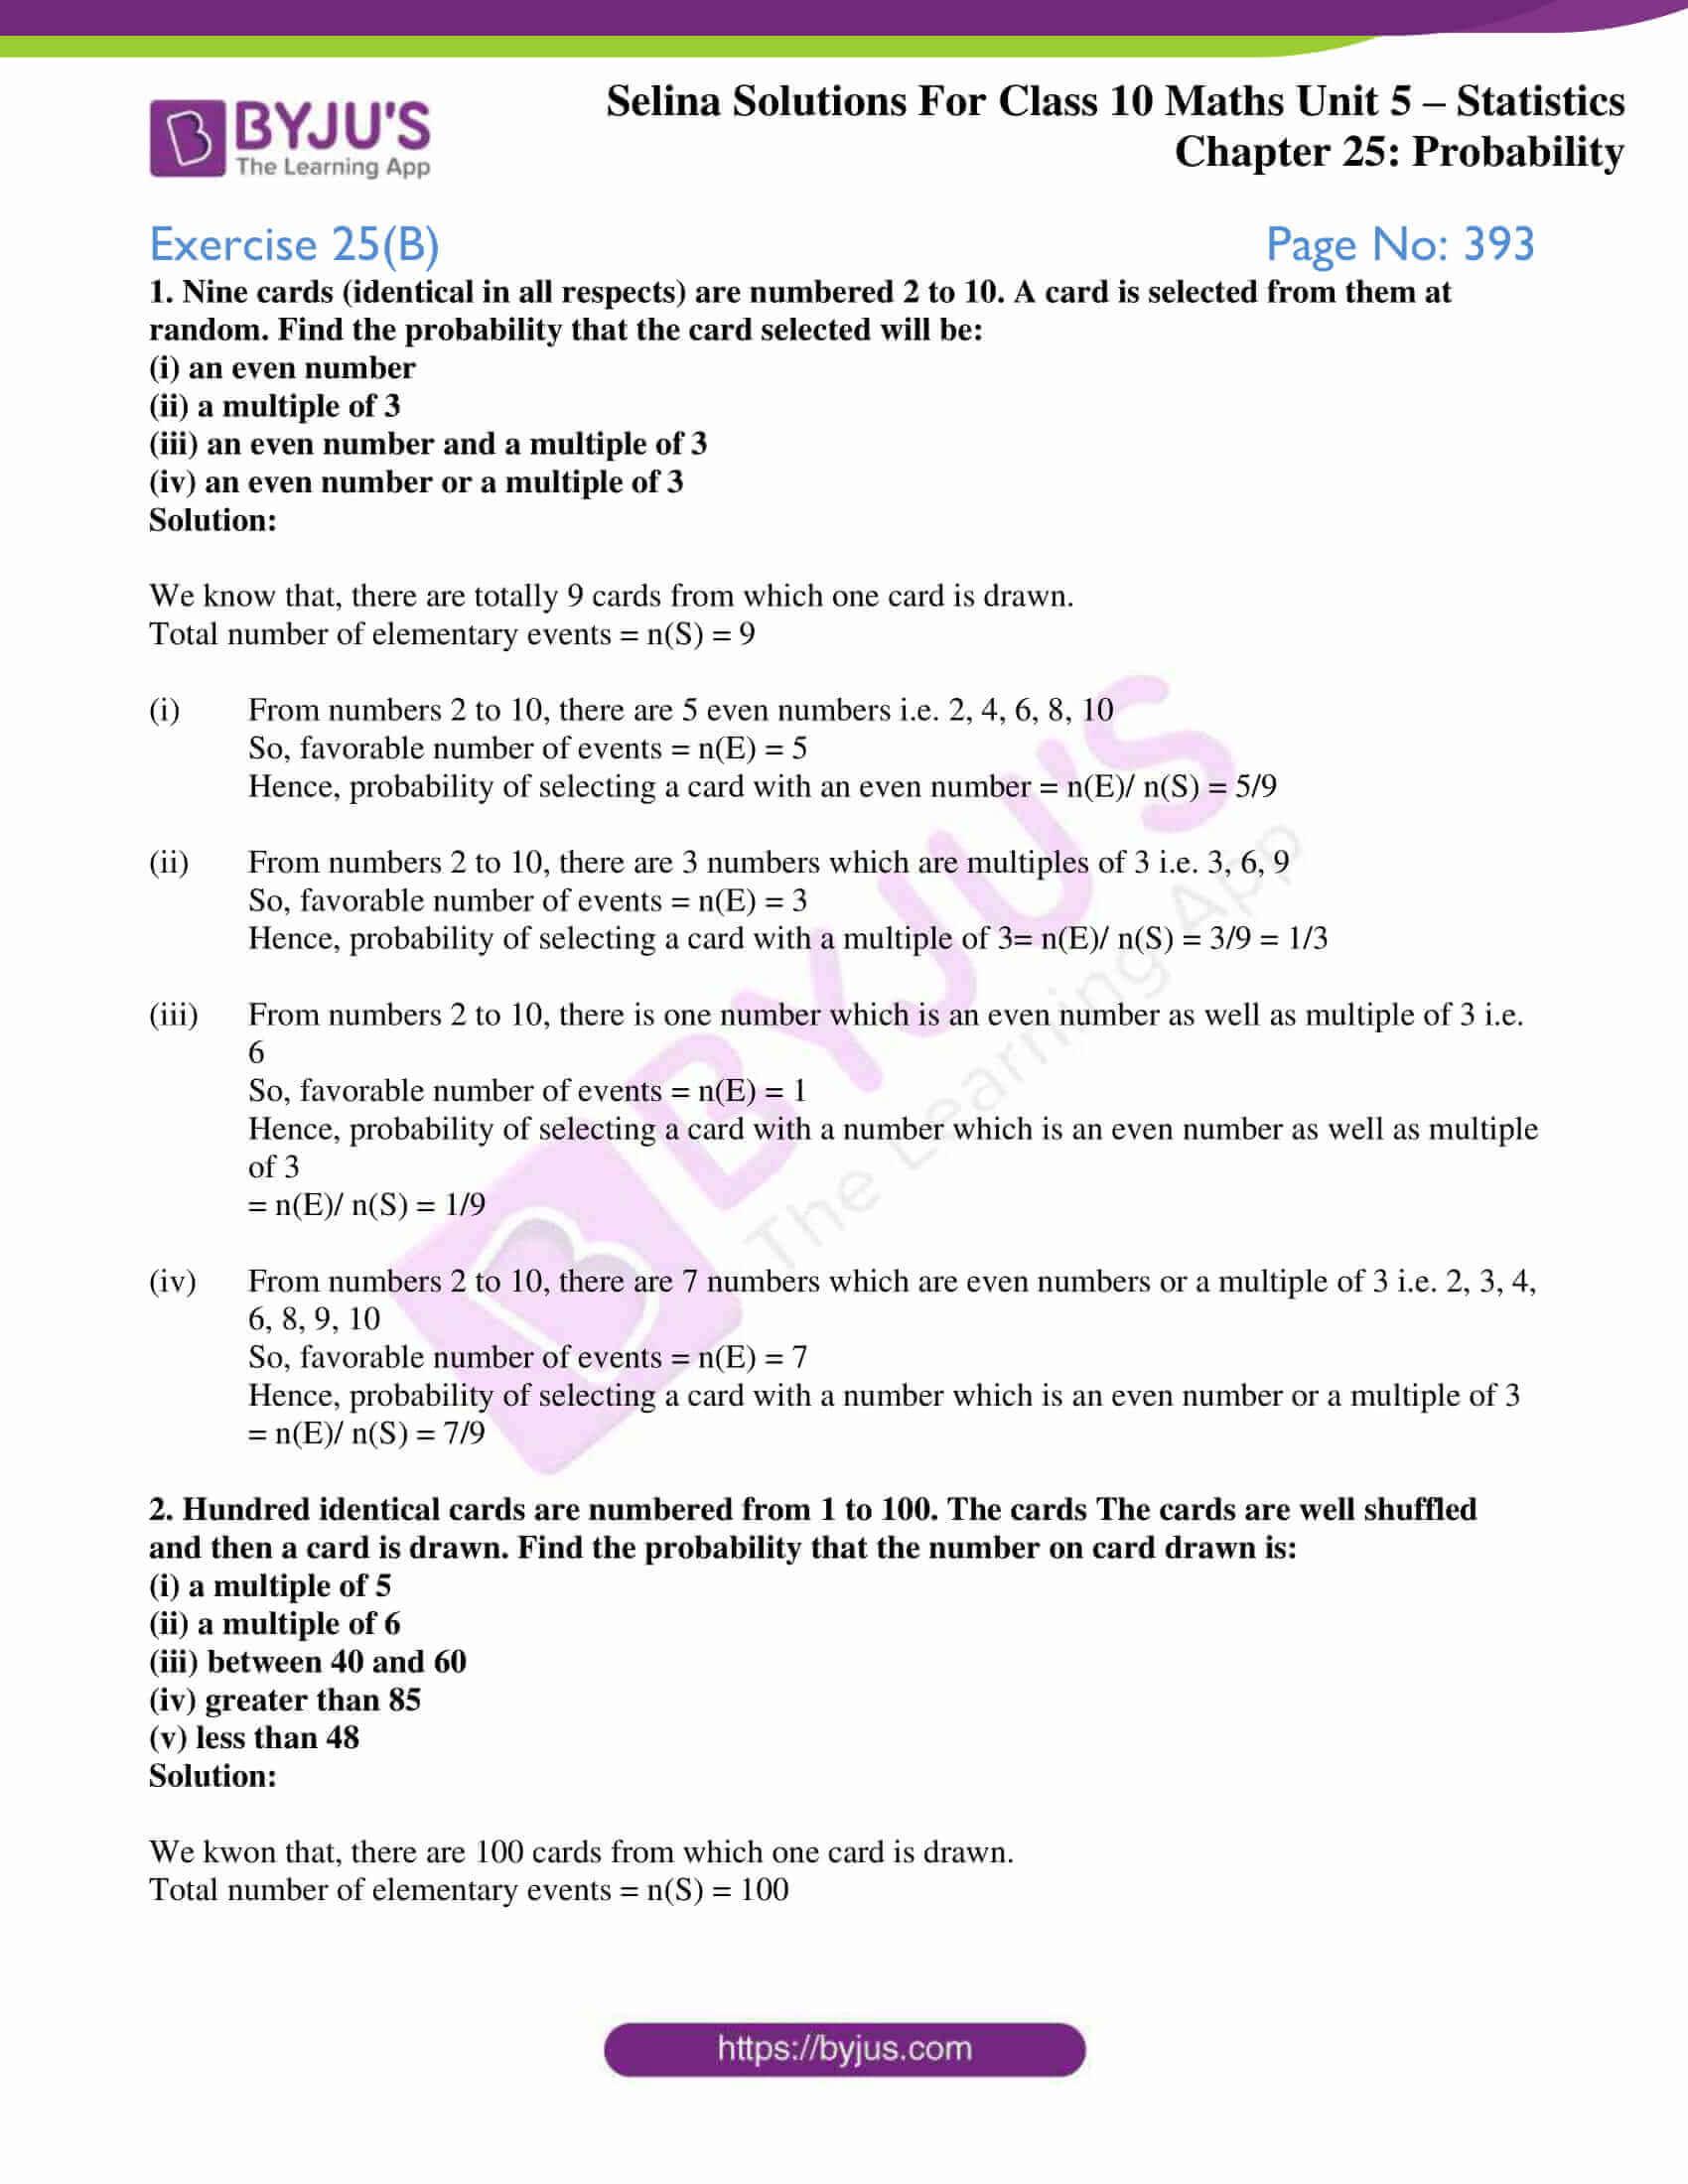 selina-sol-maths-class-10-ch-25-ex-b-1